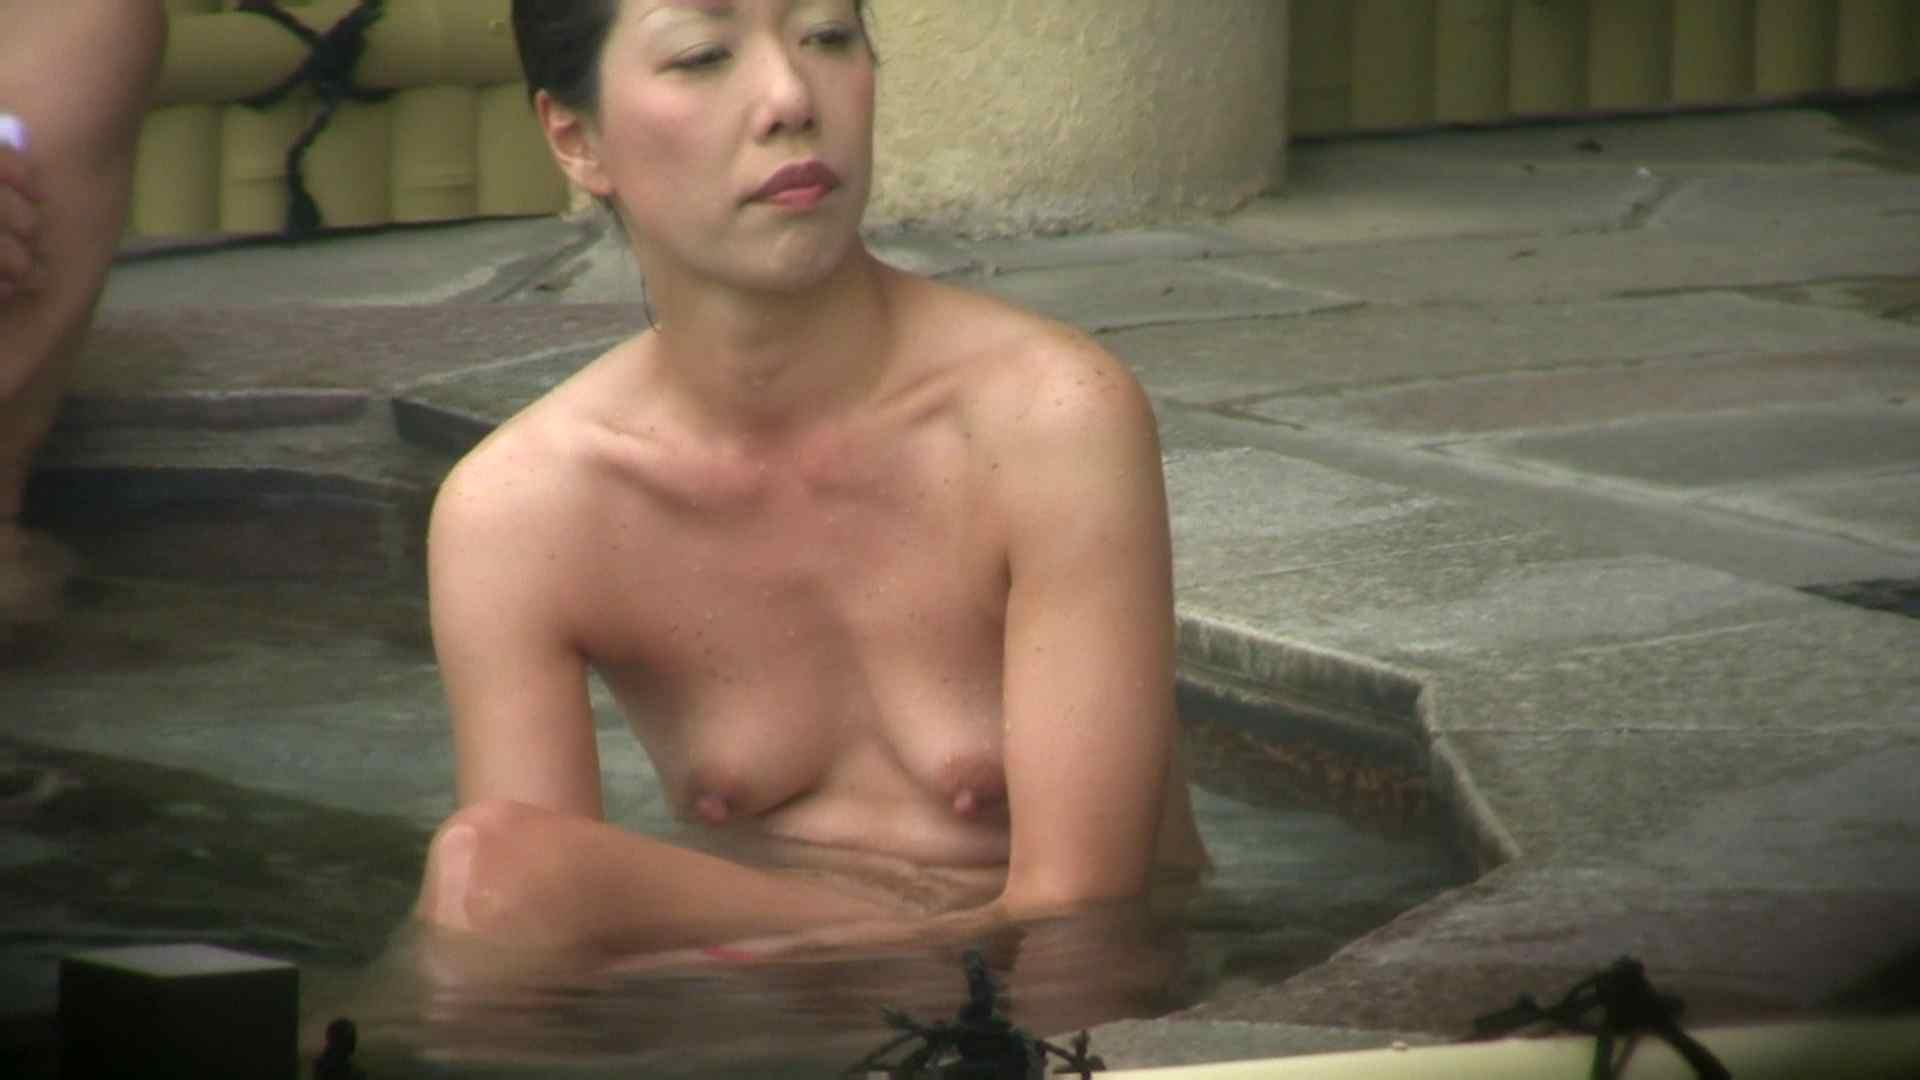 高画質露天女風呂観察 vol.036 望遠 ヌード画像 84pic 20